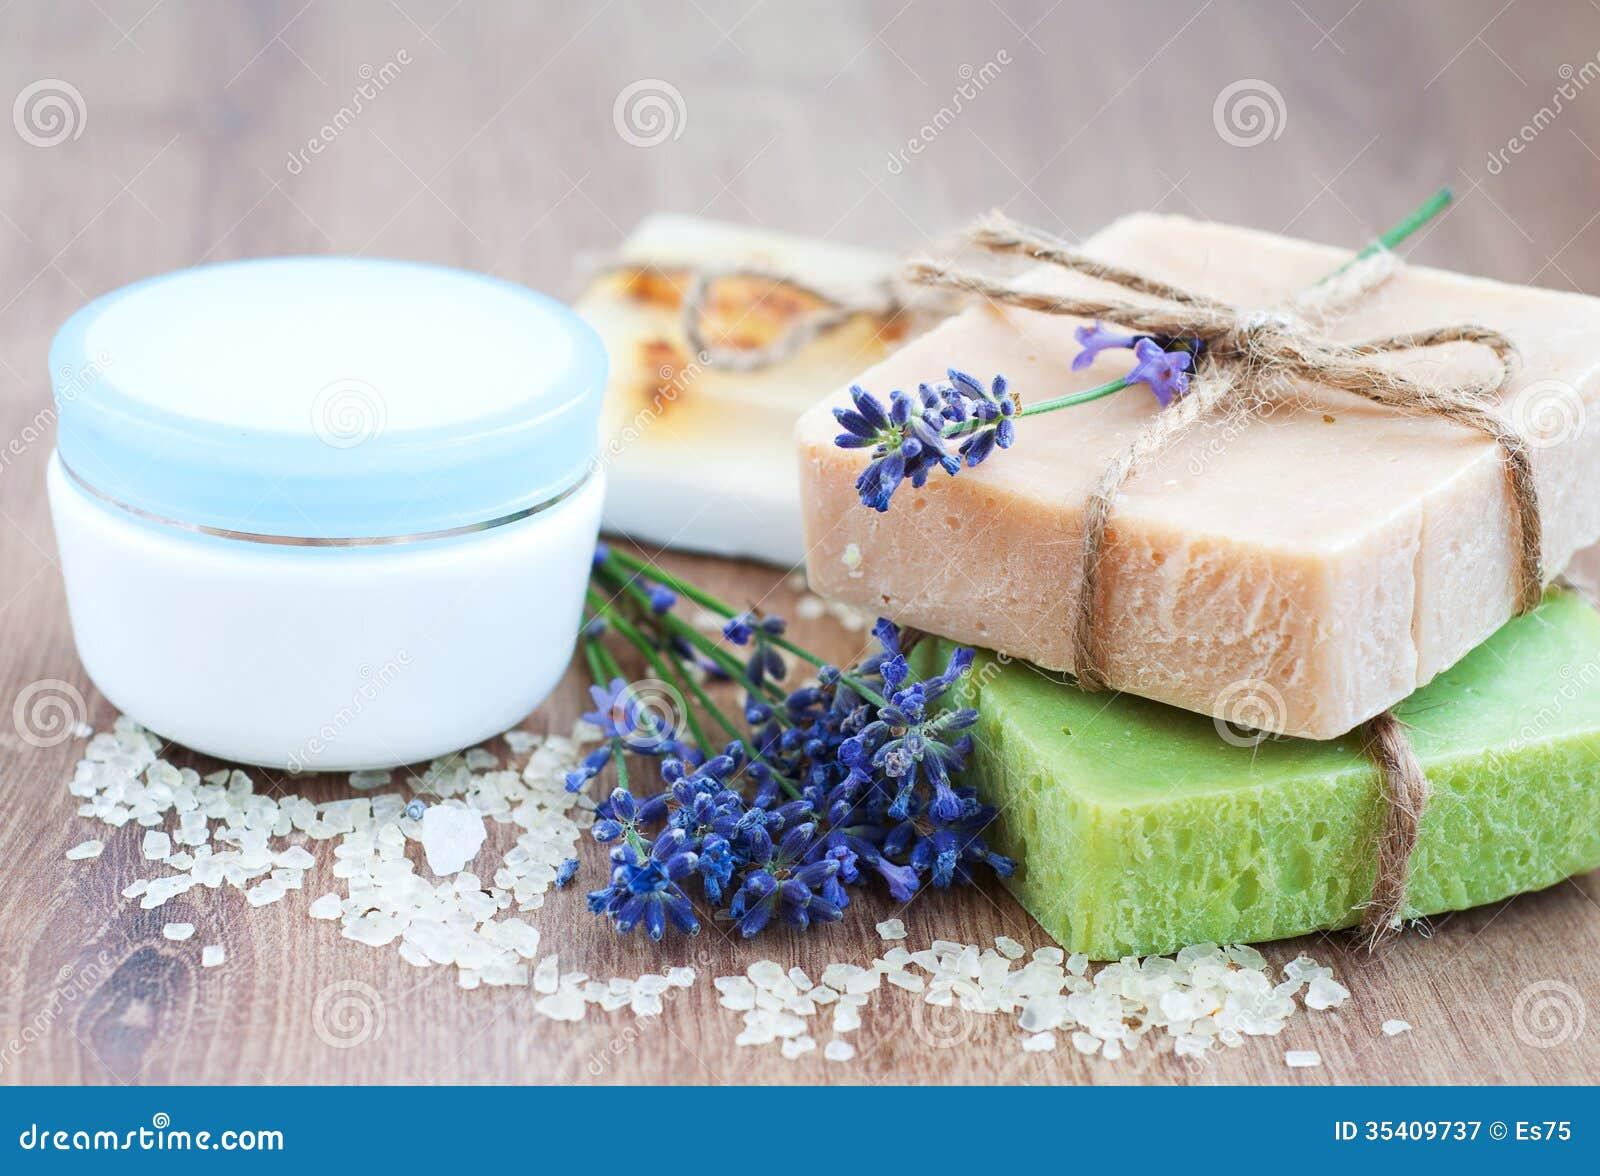 Natural Herbal Soap Royalty Free Stock Photography